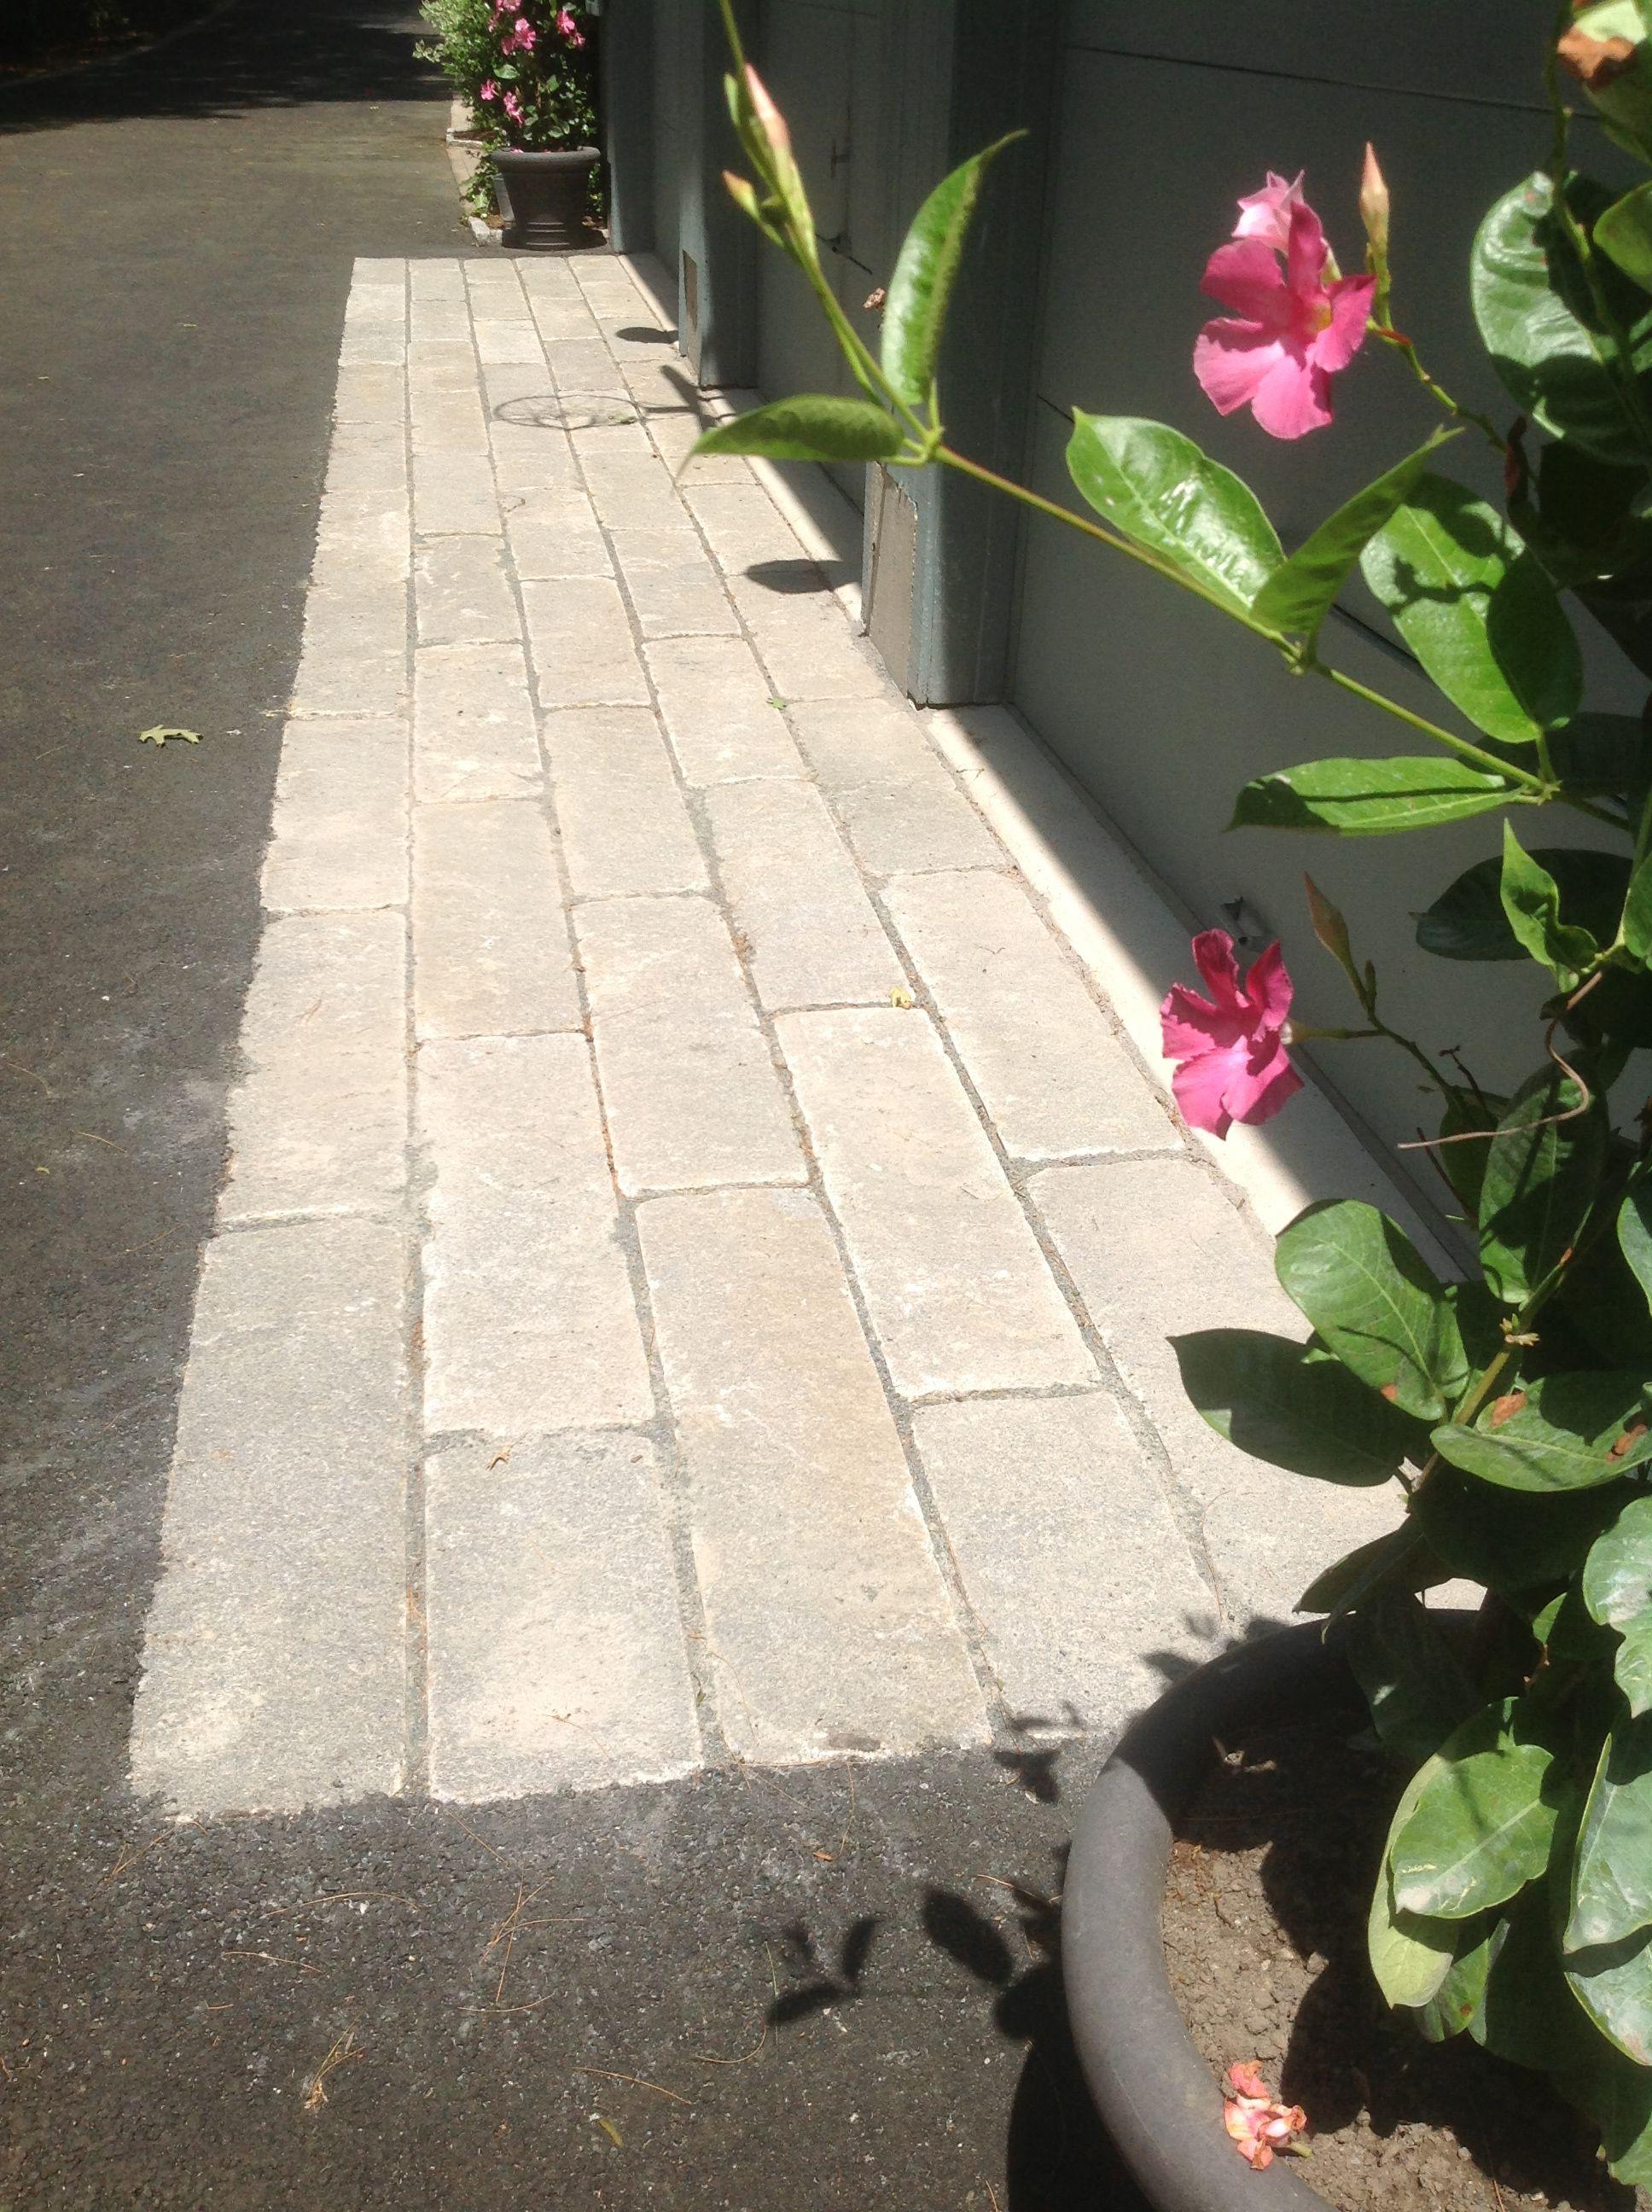 Reclaimed granite curbing used in driveway apron